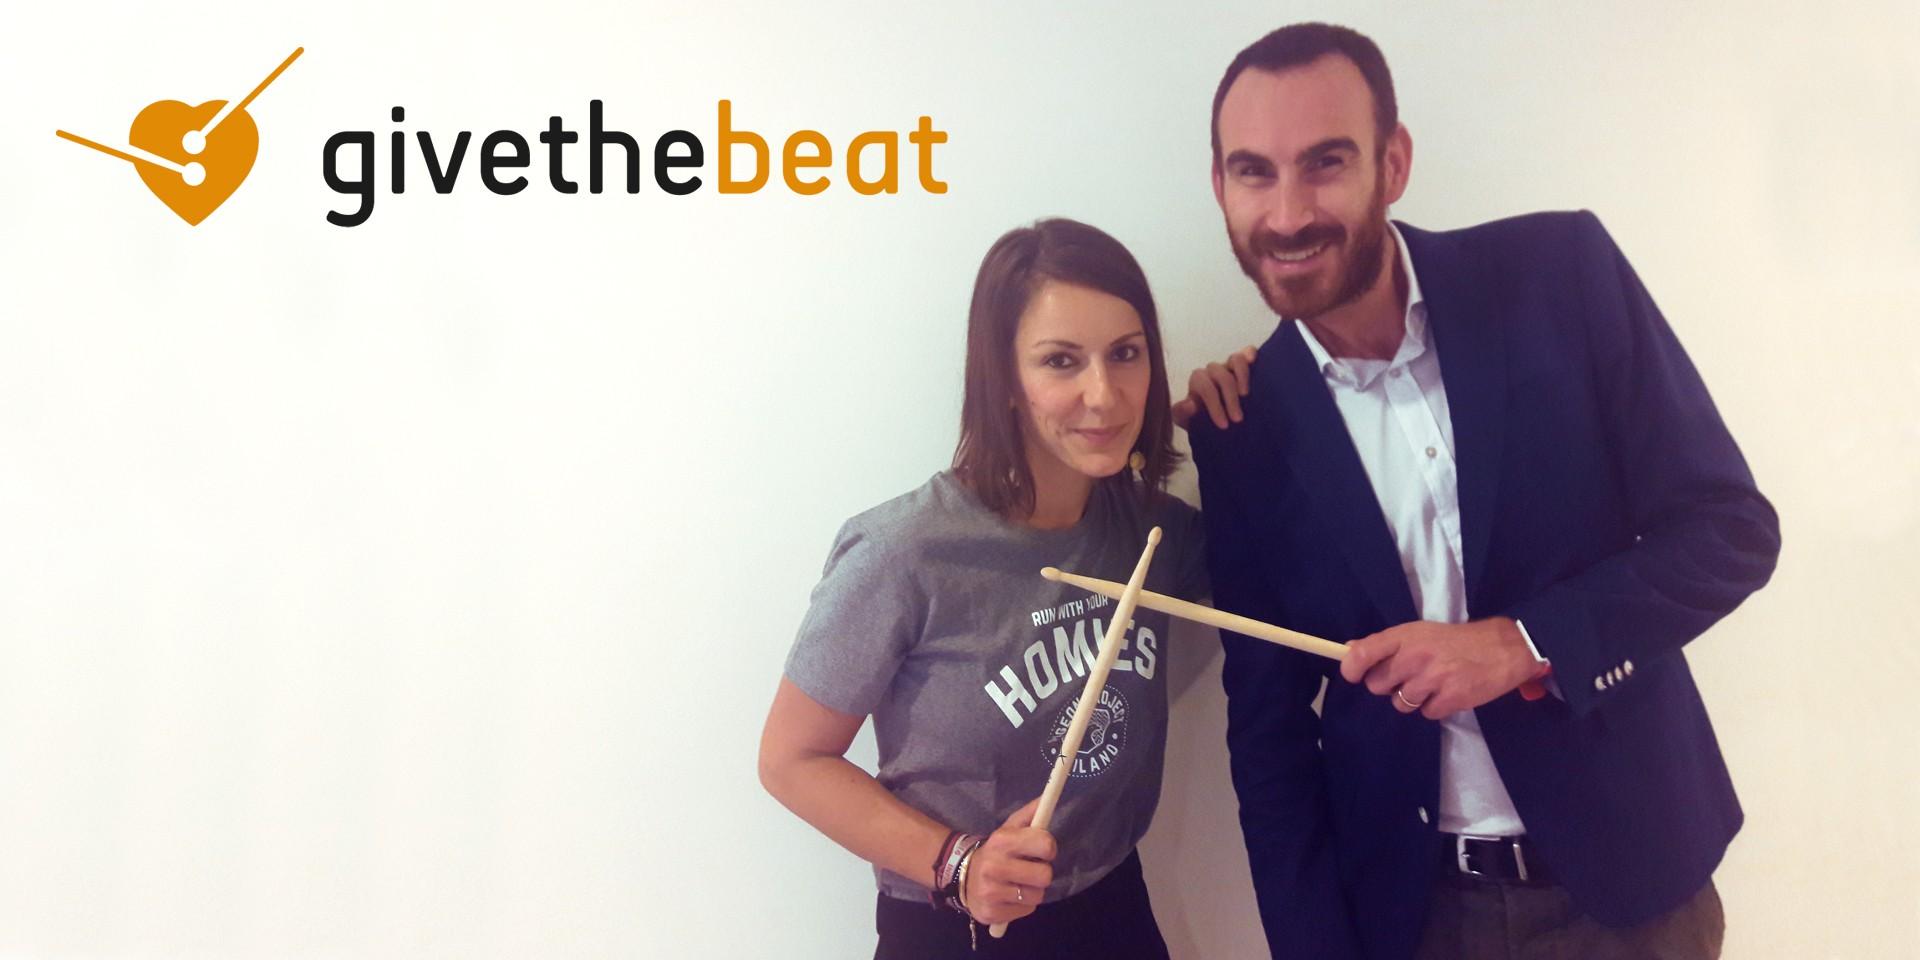 #GivetheBeat! #MrandMrsClaus-Giorgia Bottacchi